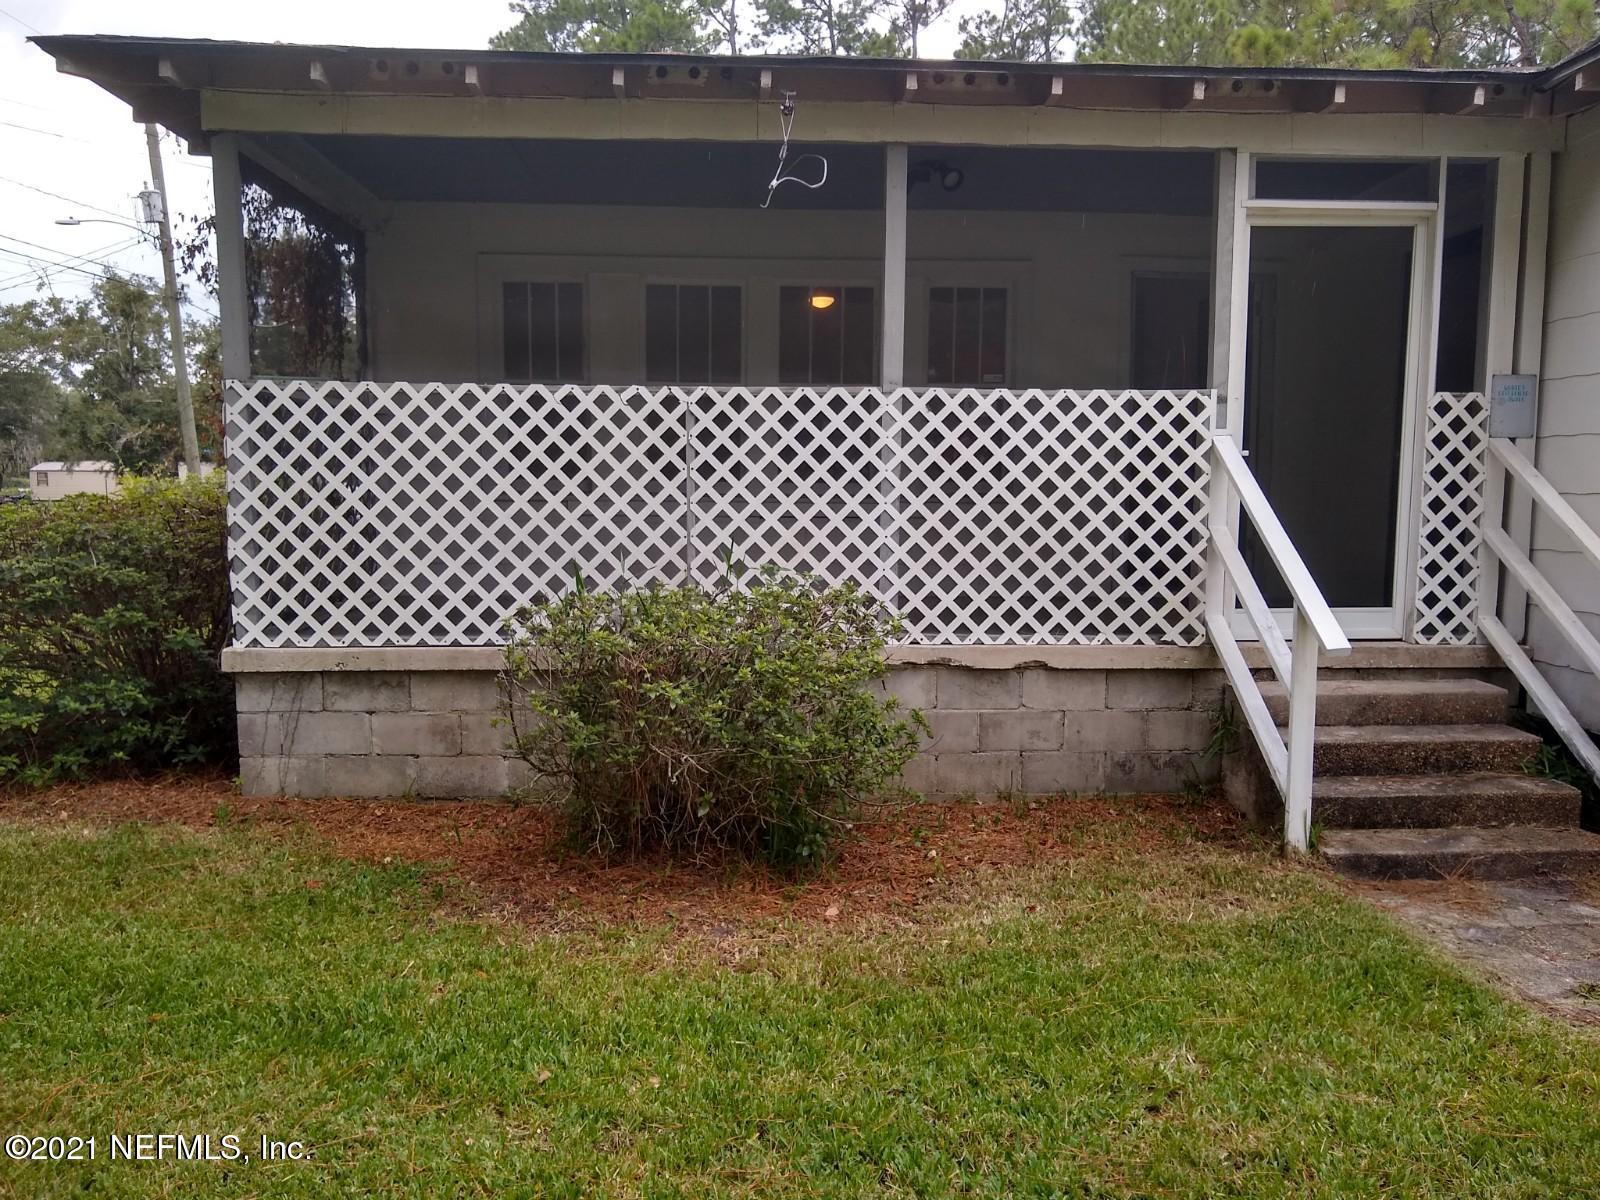 3049 HARBISON, JACKSONVILLE, FLORIDA 32218, 5 Bedrooms Bedrooms, ,2 BathroomsBathrooms,Investment / MultiFamily,For sale,HARBISON,1091082